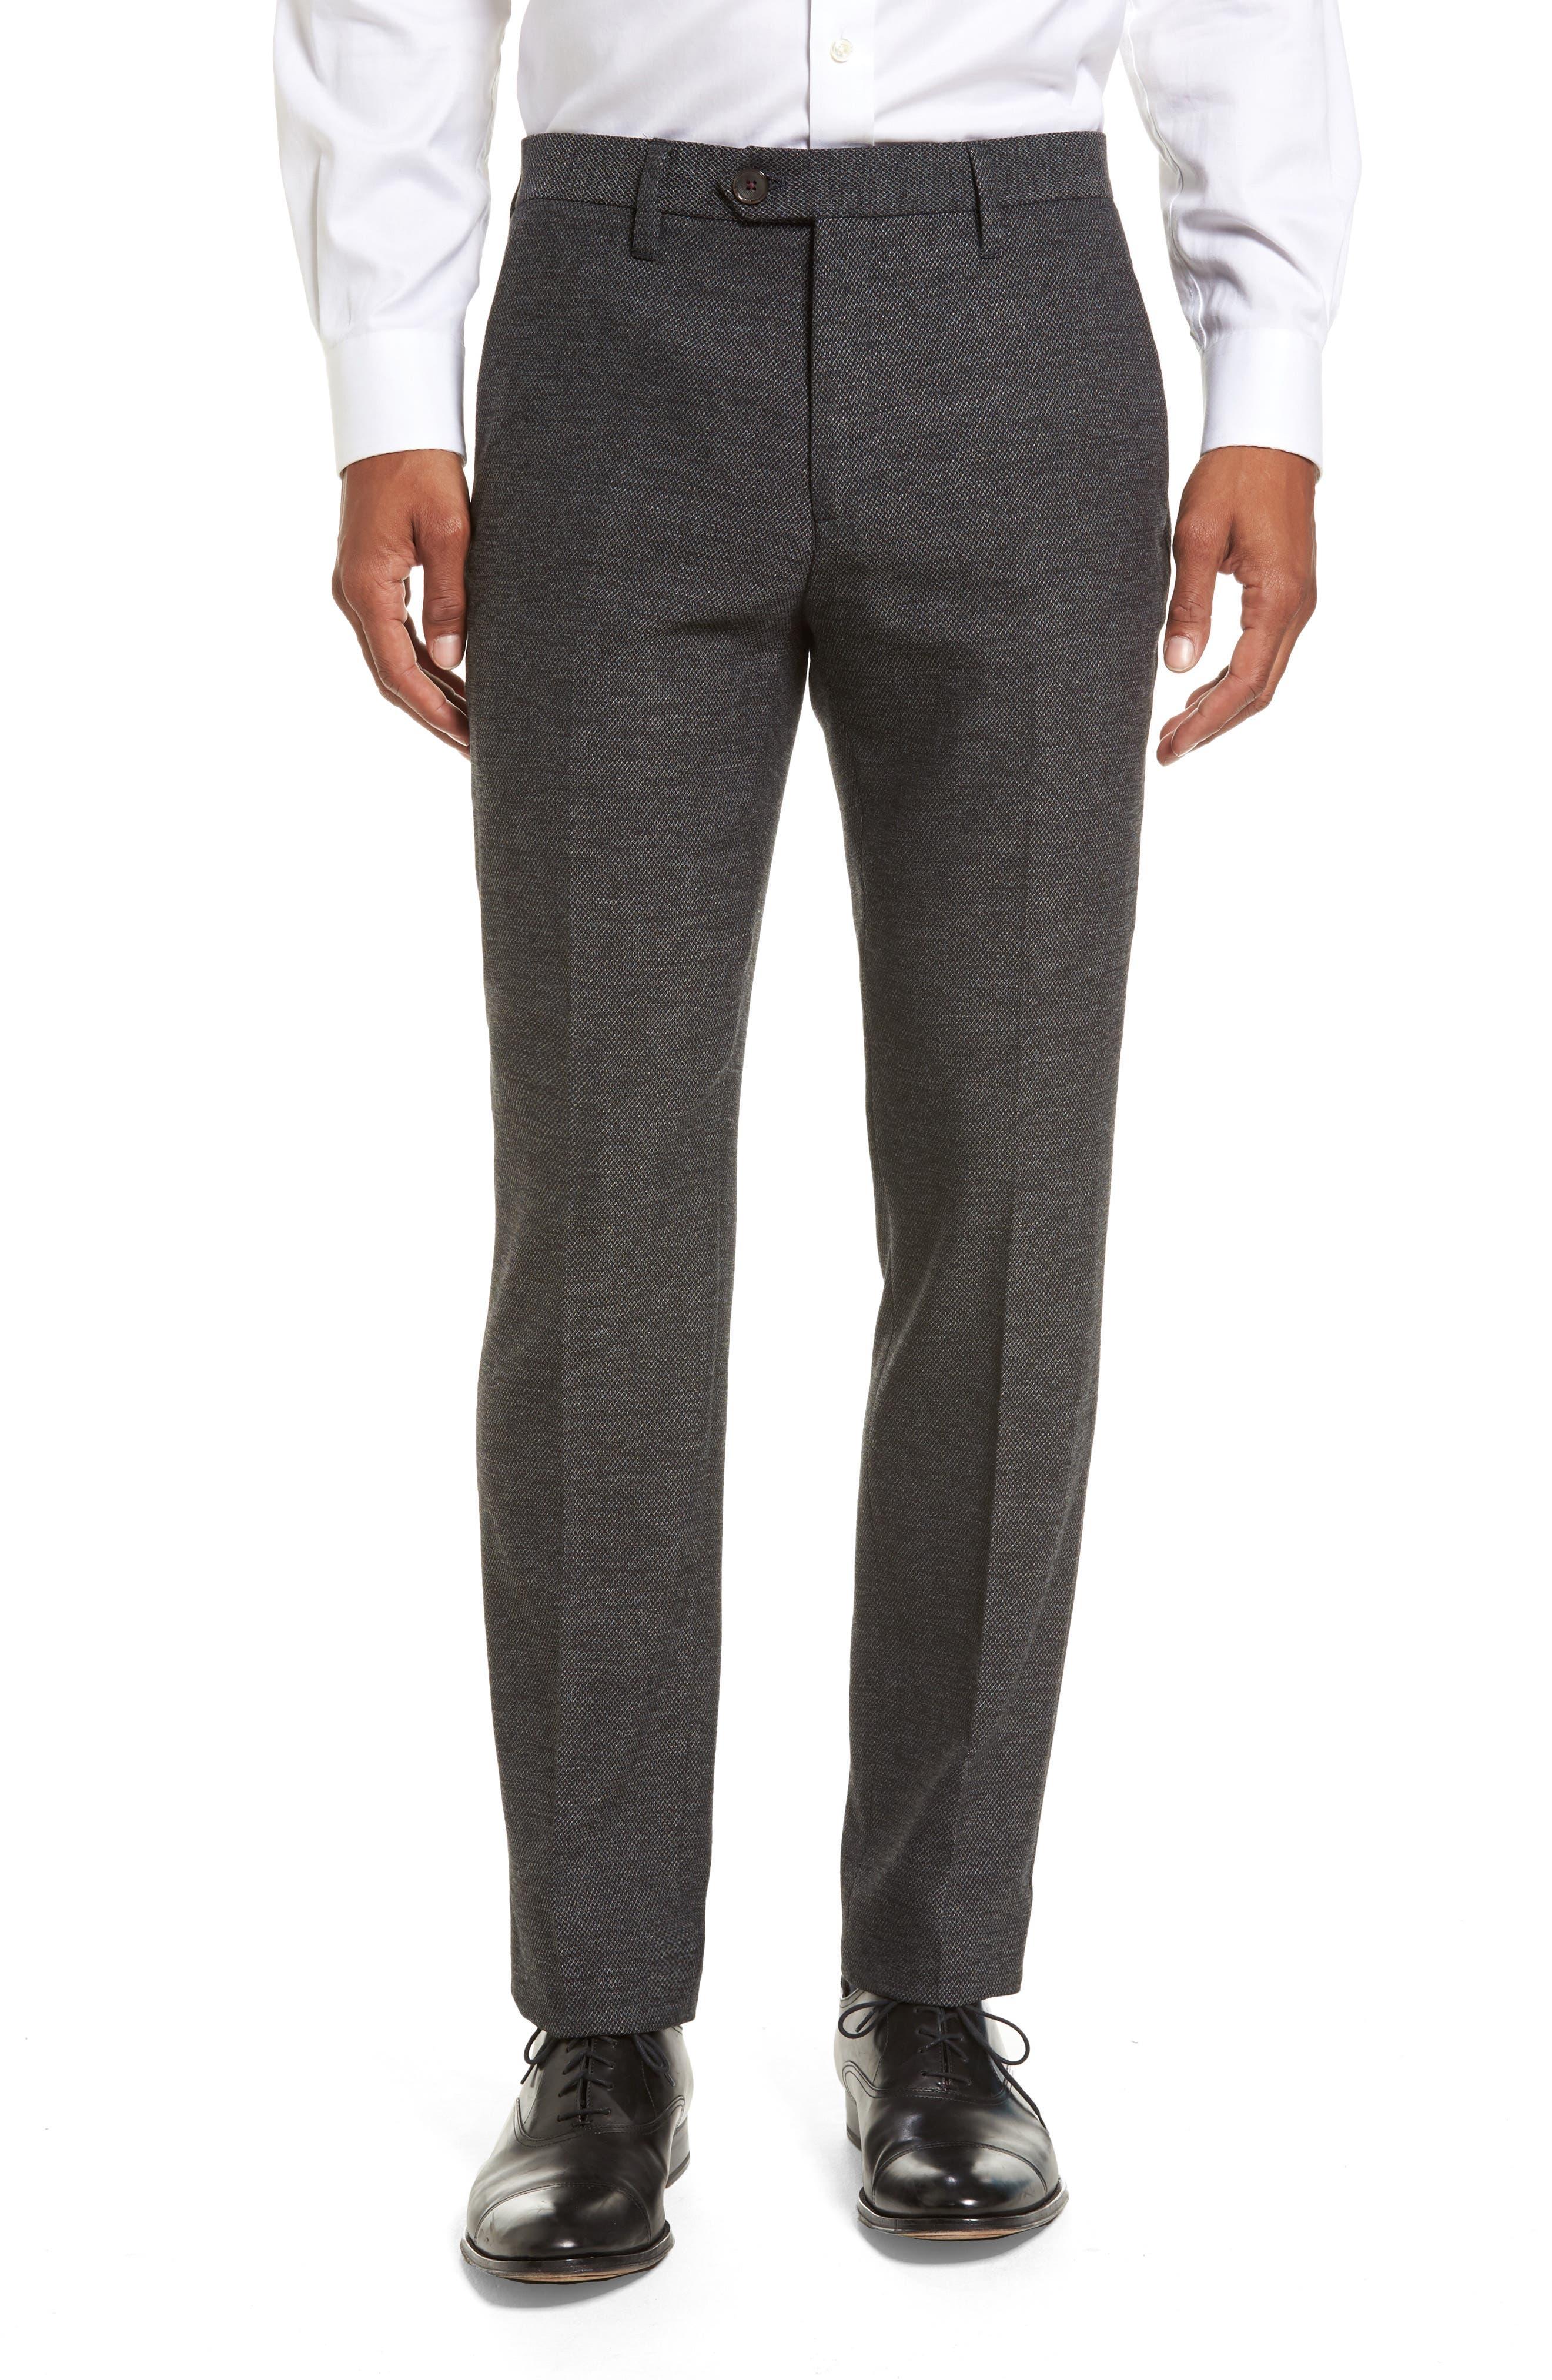 Ted Baker London Porttro Modern Slim Fit Trousers